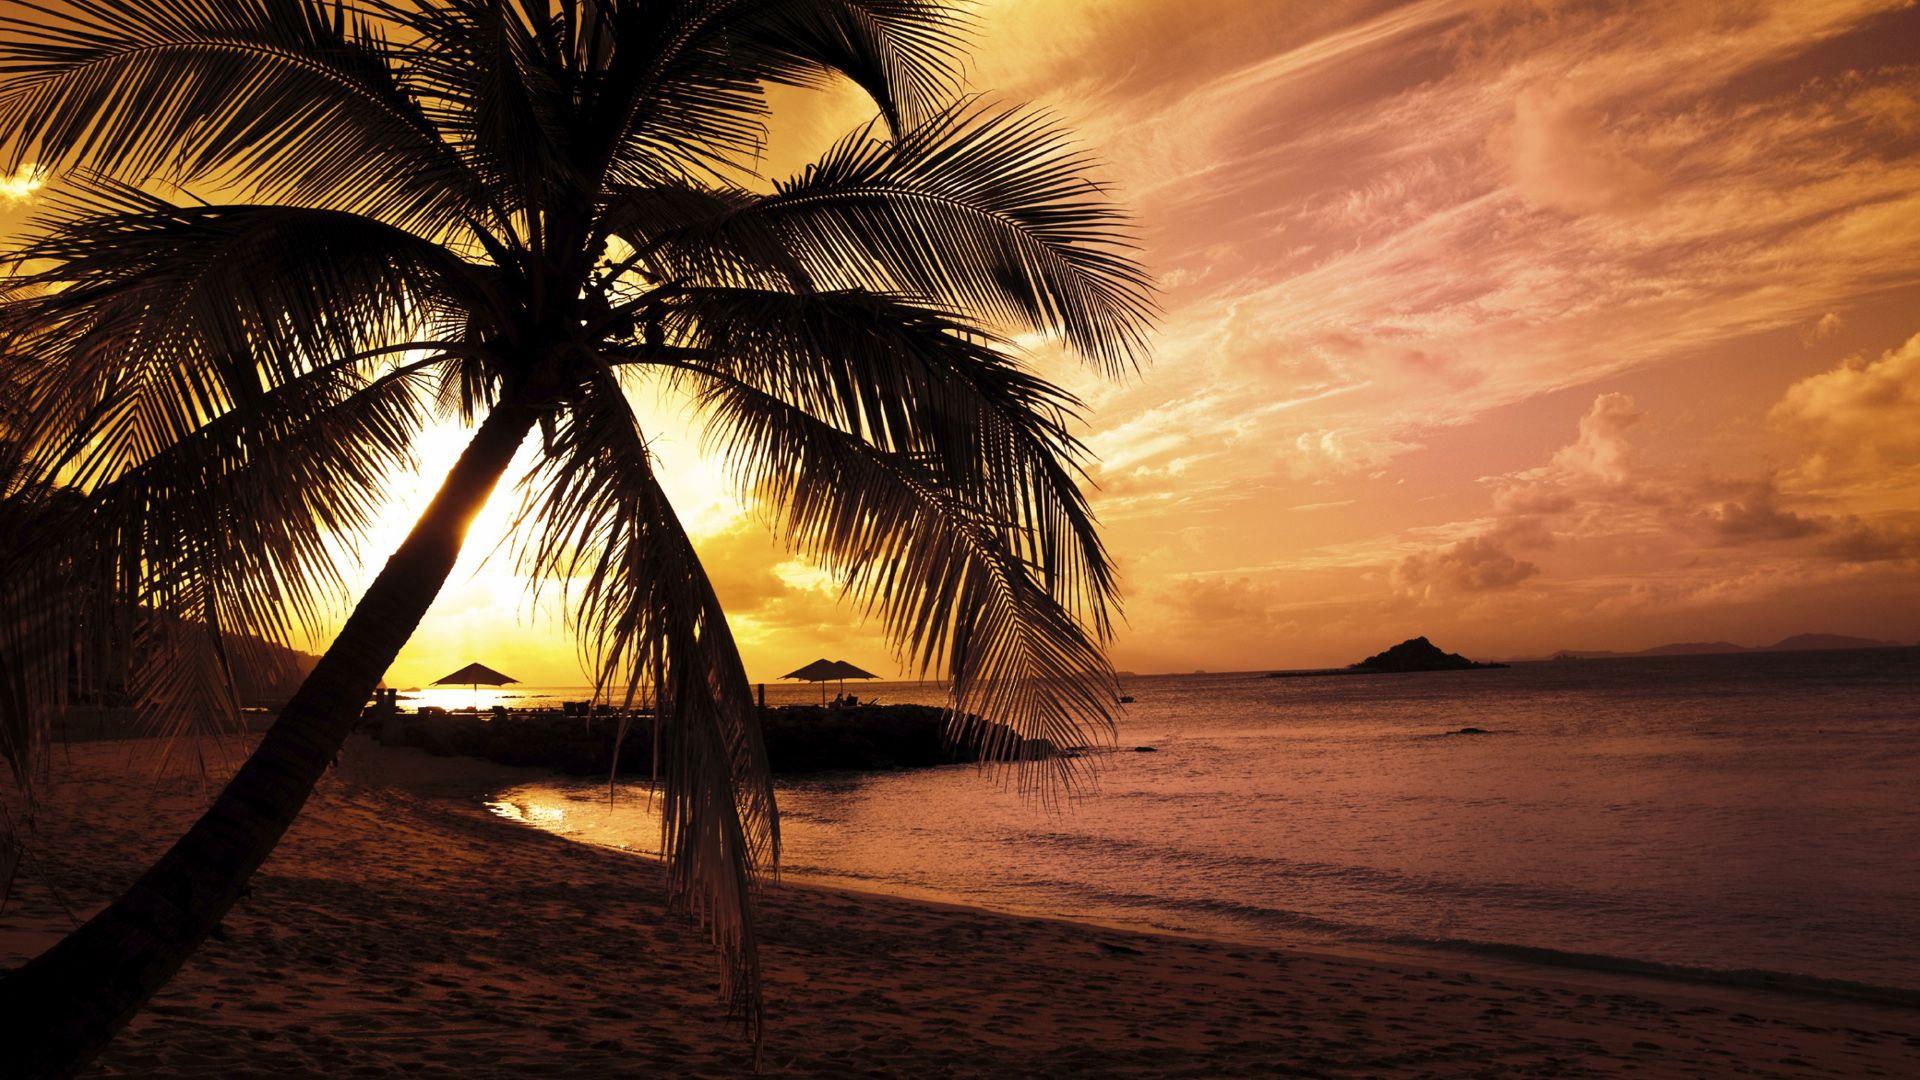 hawaii beach night #1